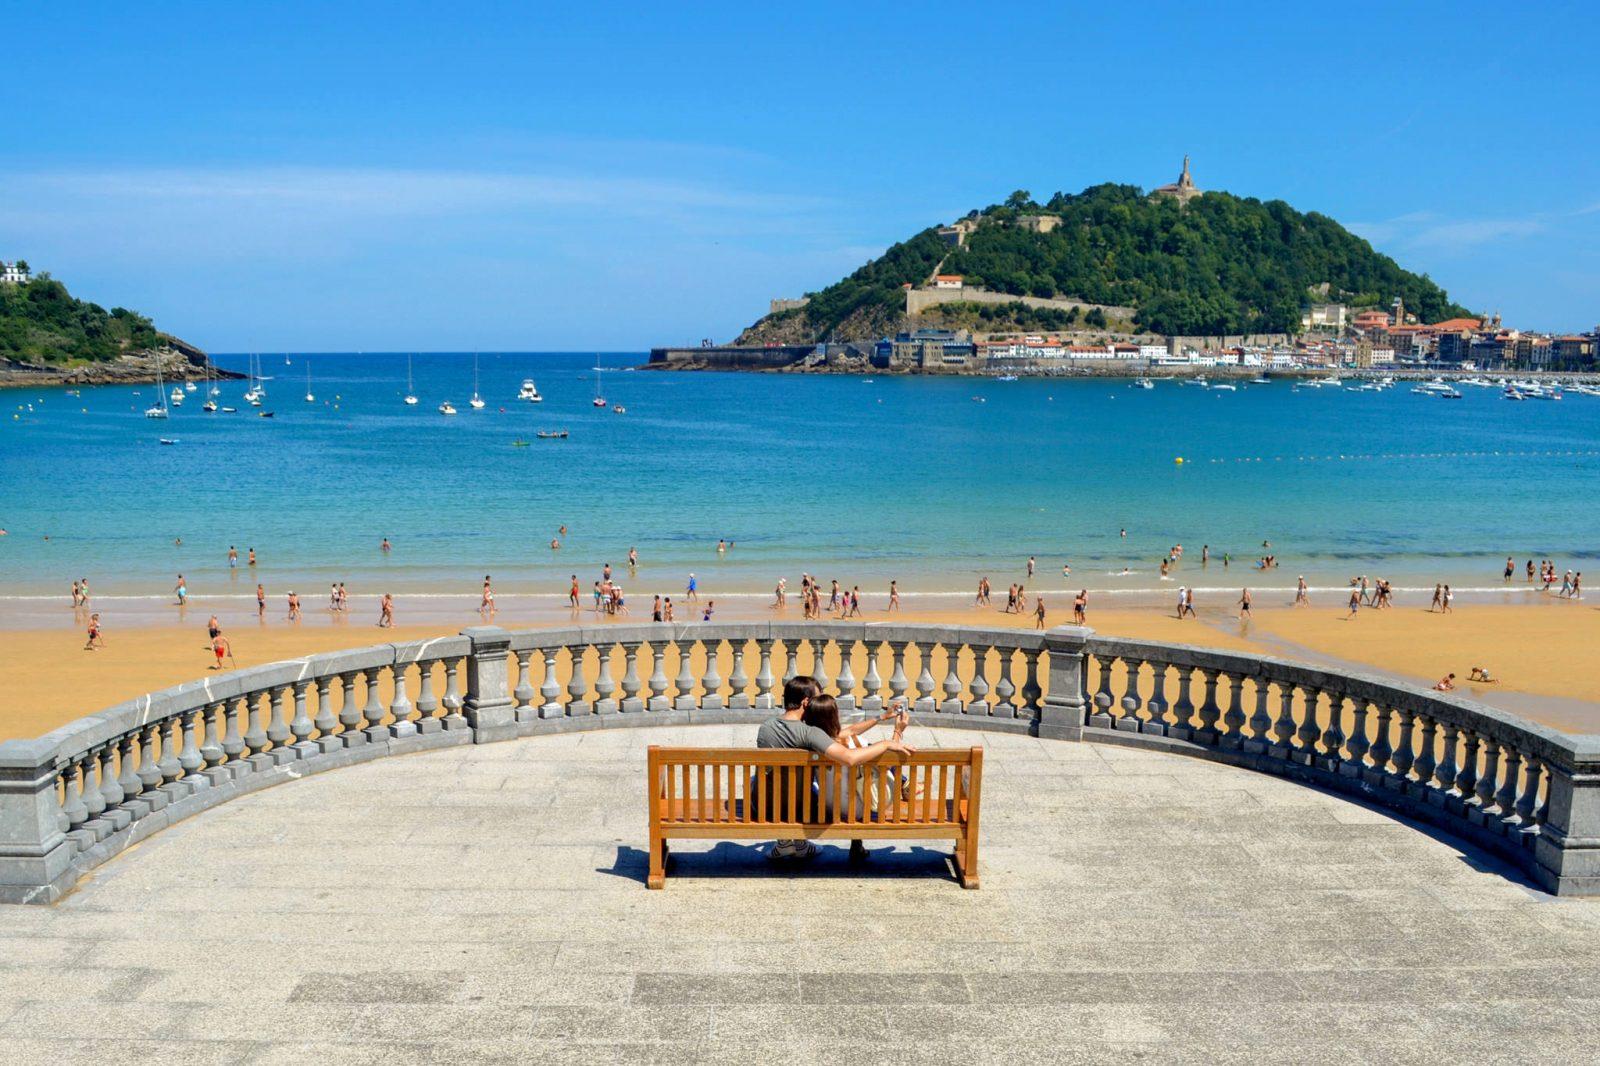 Хорошая погода для купания (фото: Simonetta Di Zanutto)